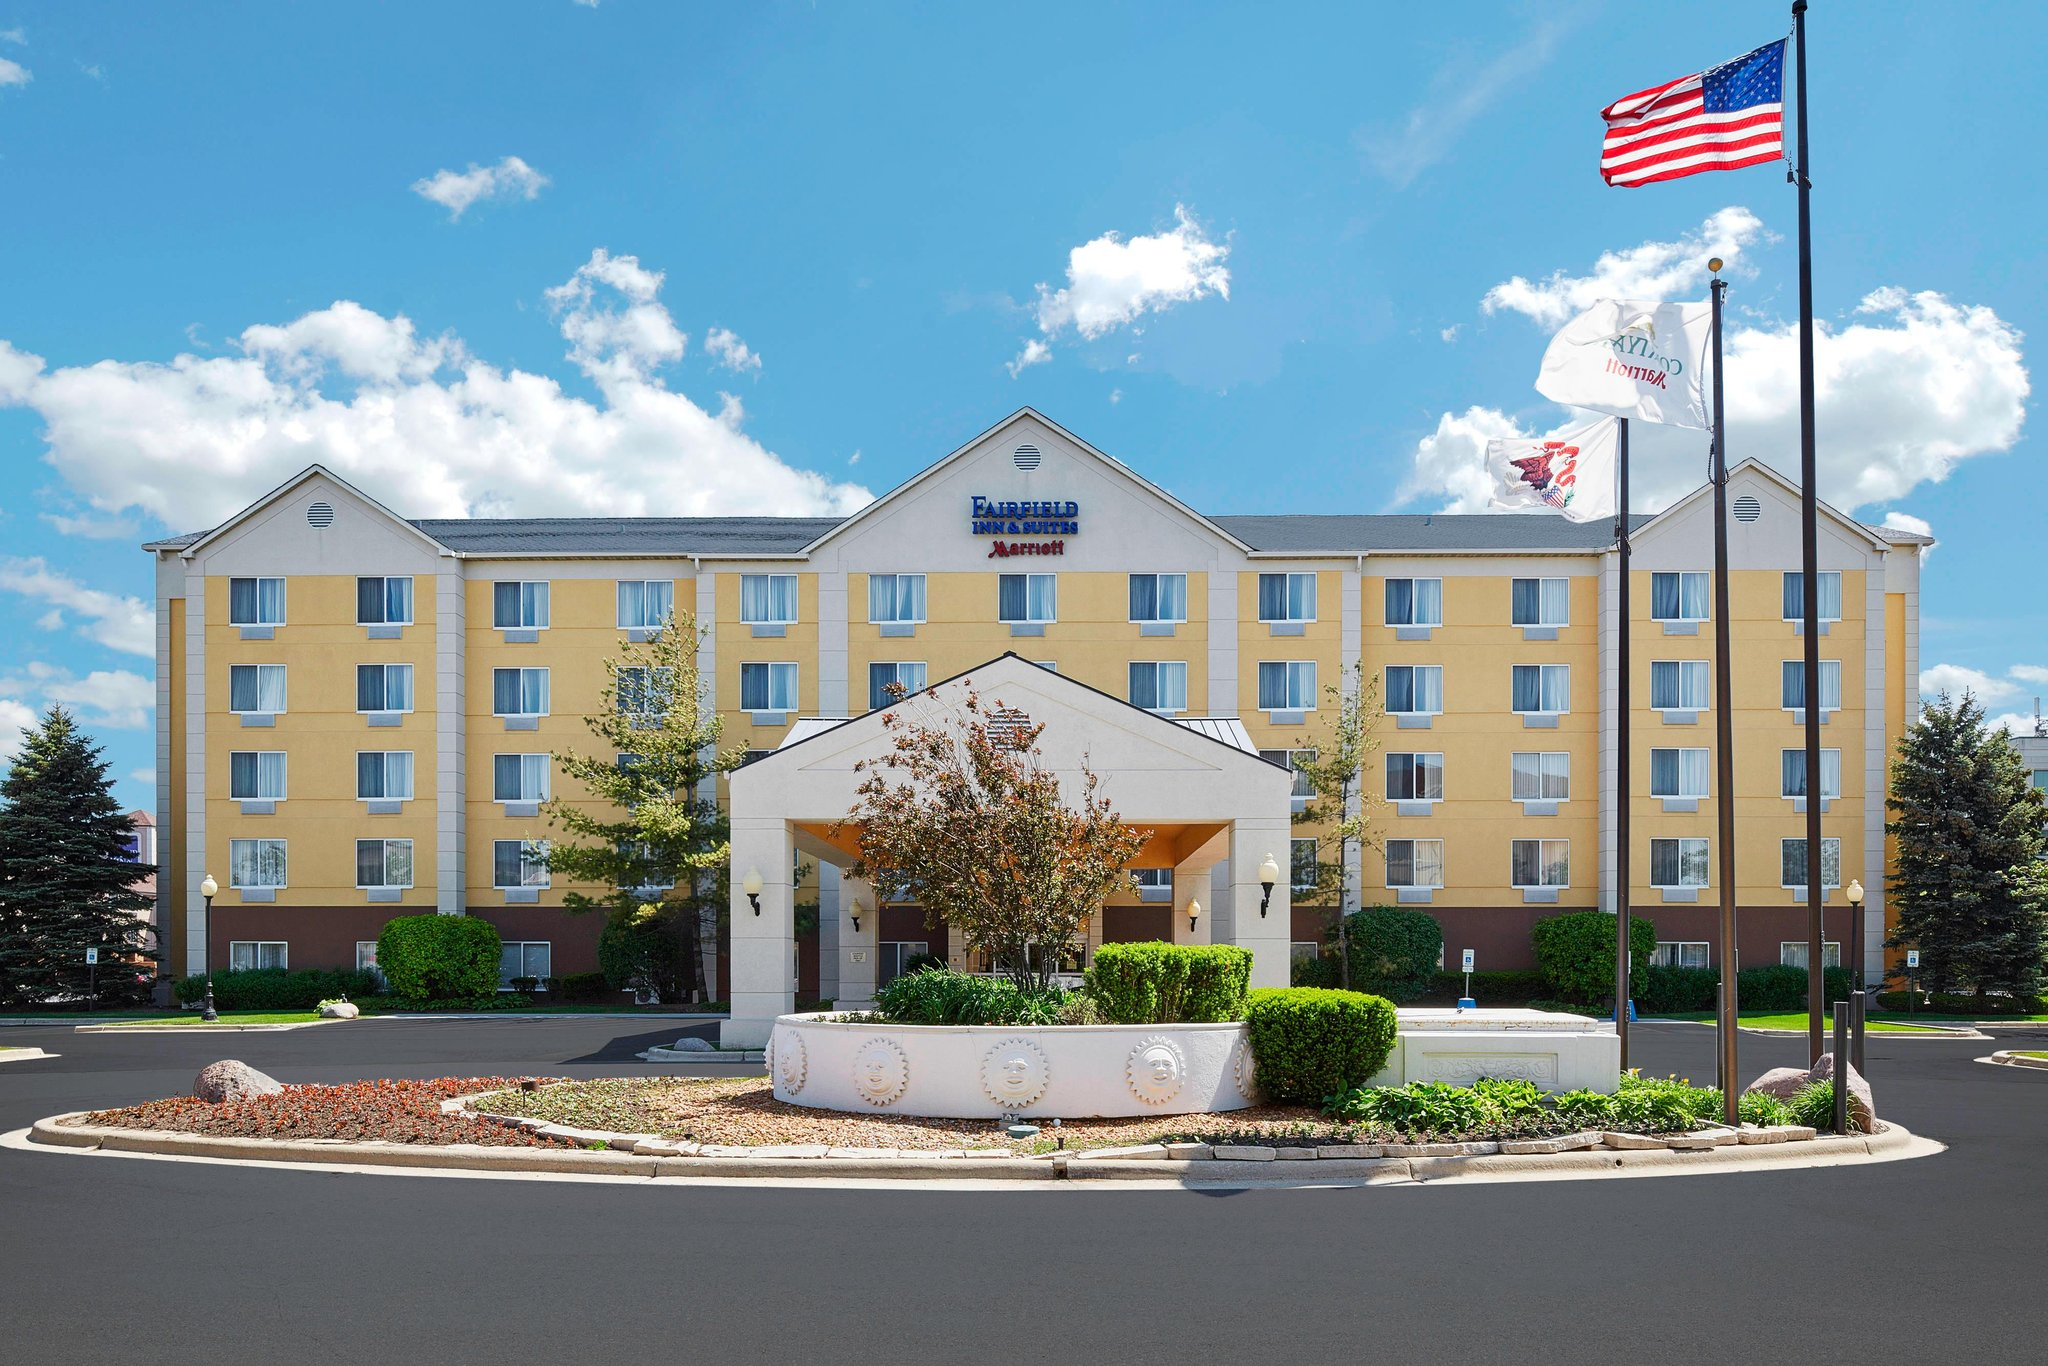 Fairfield Inn/Suites Chicago Midway Arpt